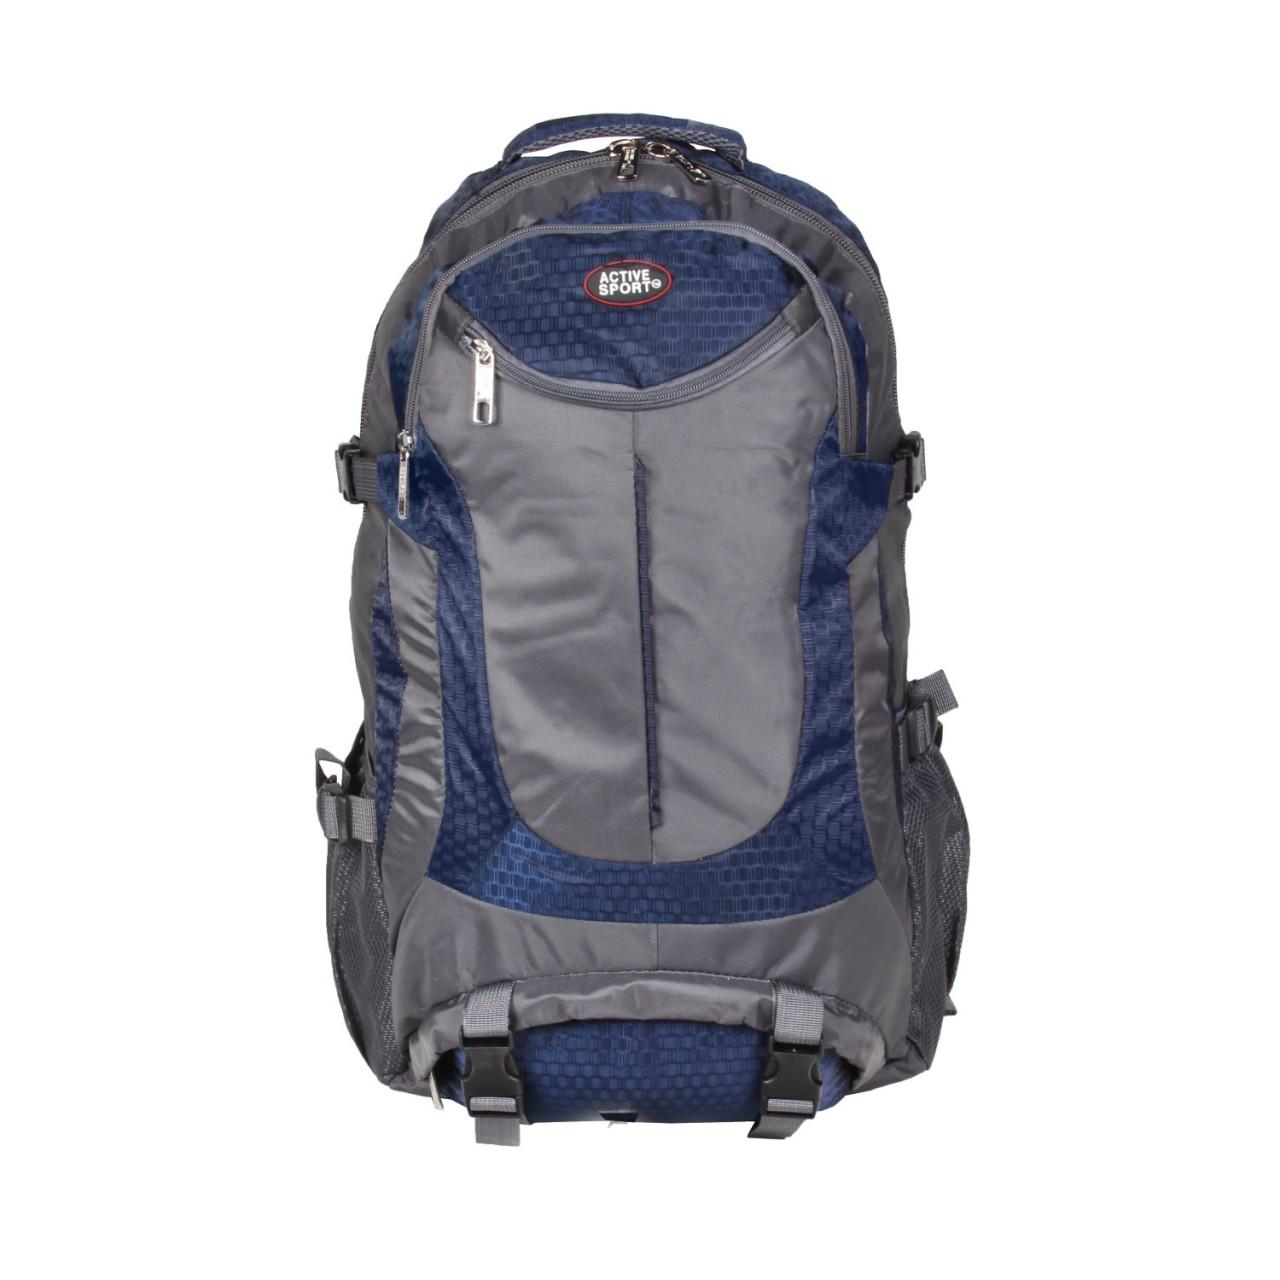 Rucksack ACTIVE SPORT 30 L - Blau